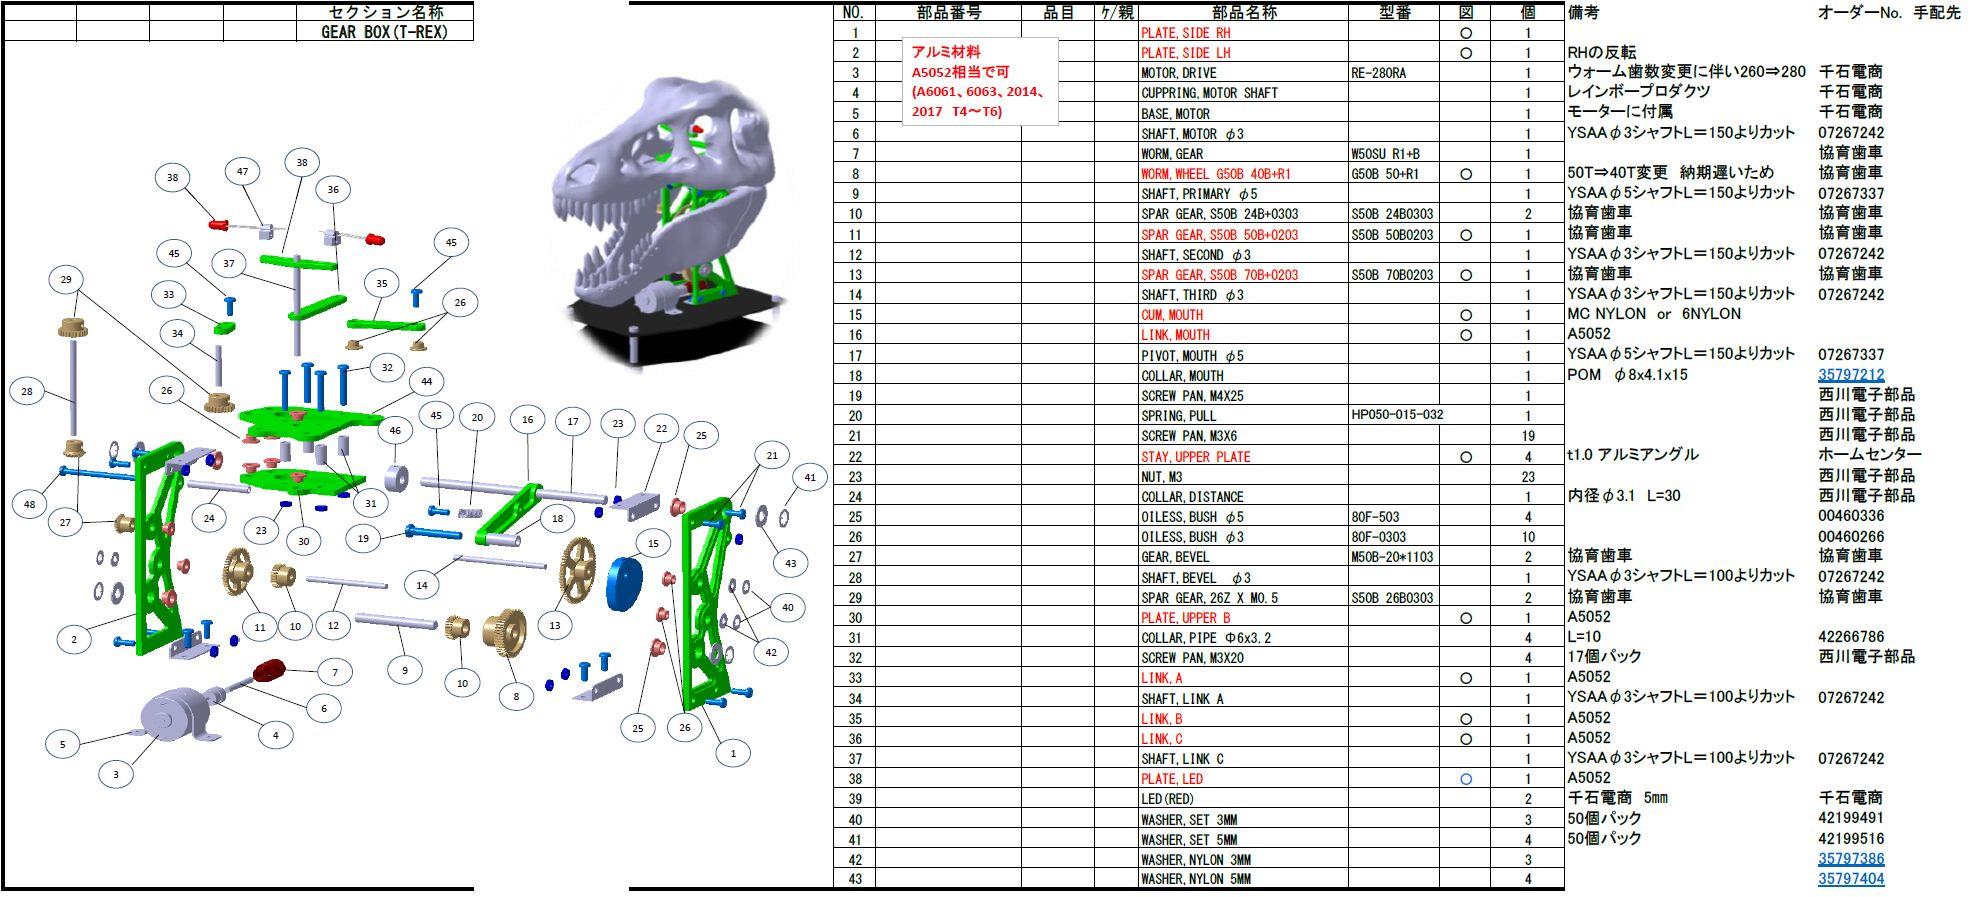 Partslist-latest-001-3500-3500